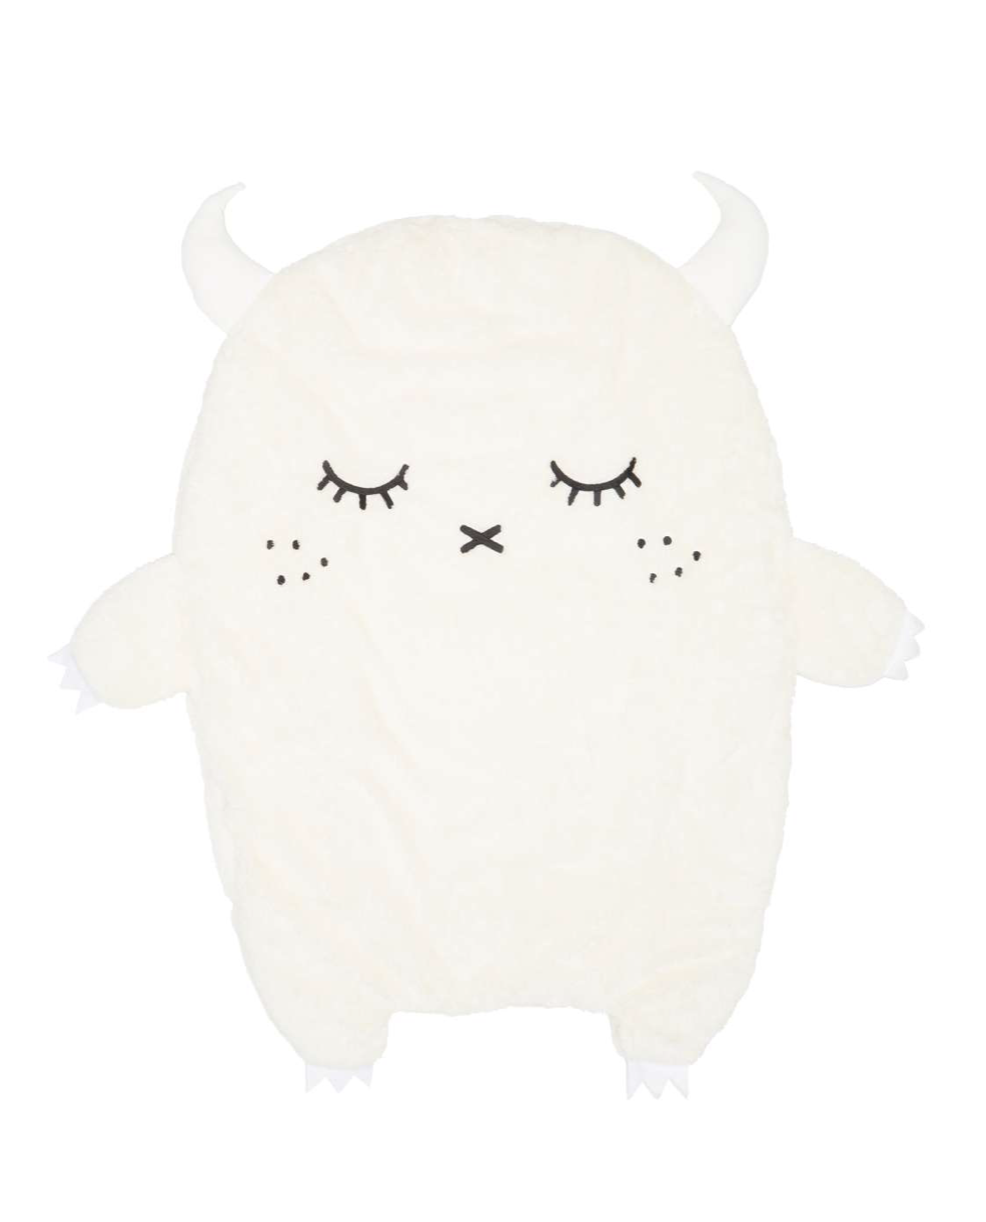 Noodoll Ricepuffy Blanket